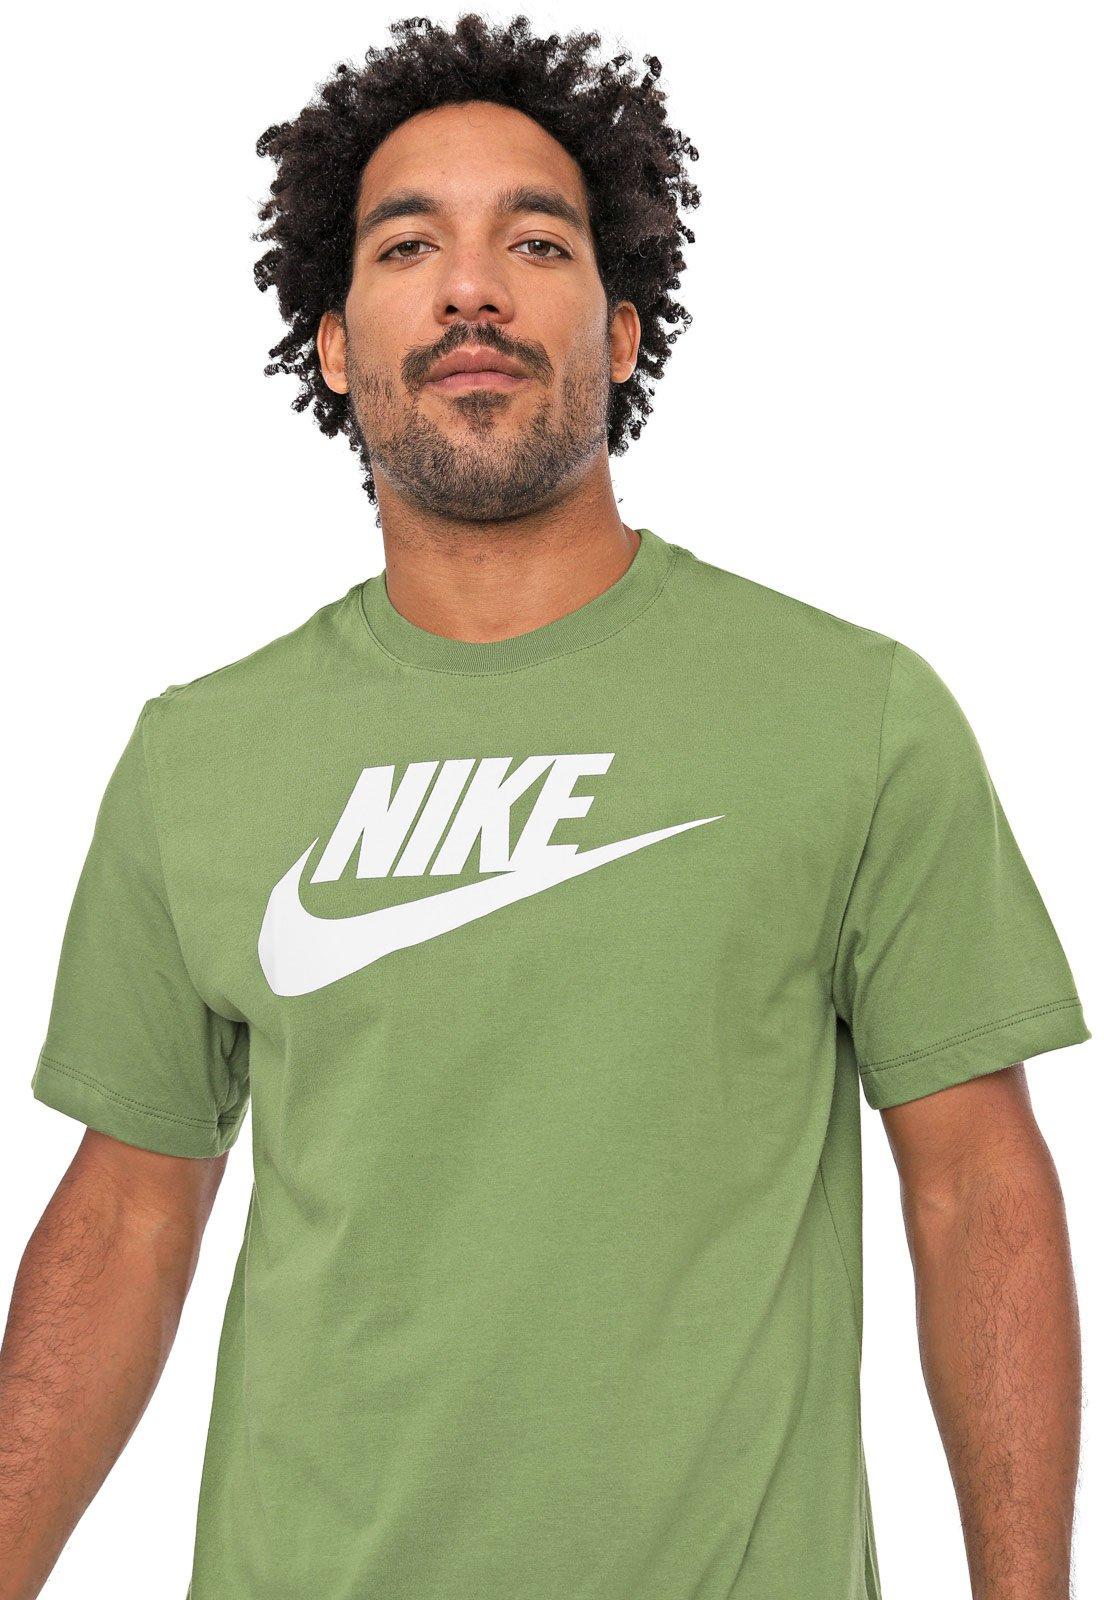 Saltar Exponer Jugar juegos de computadora  Camiseta Nike Sportswear M Nsw Tee Icon Futu Verde - Compre Agora   Dafiti  Brasil